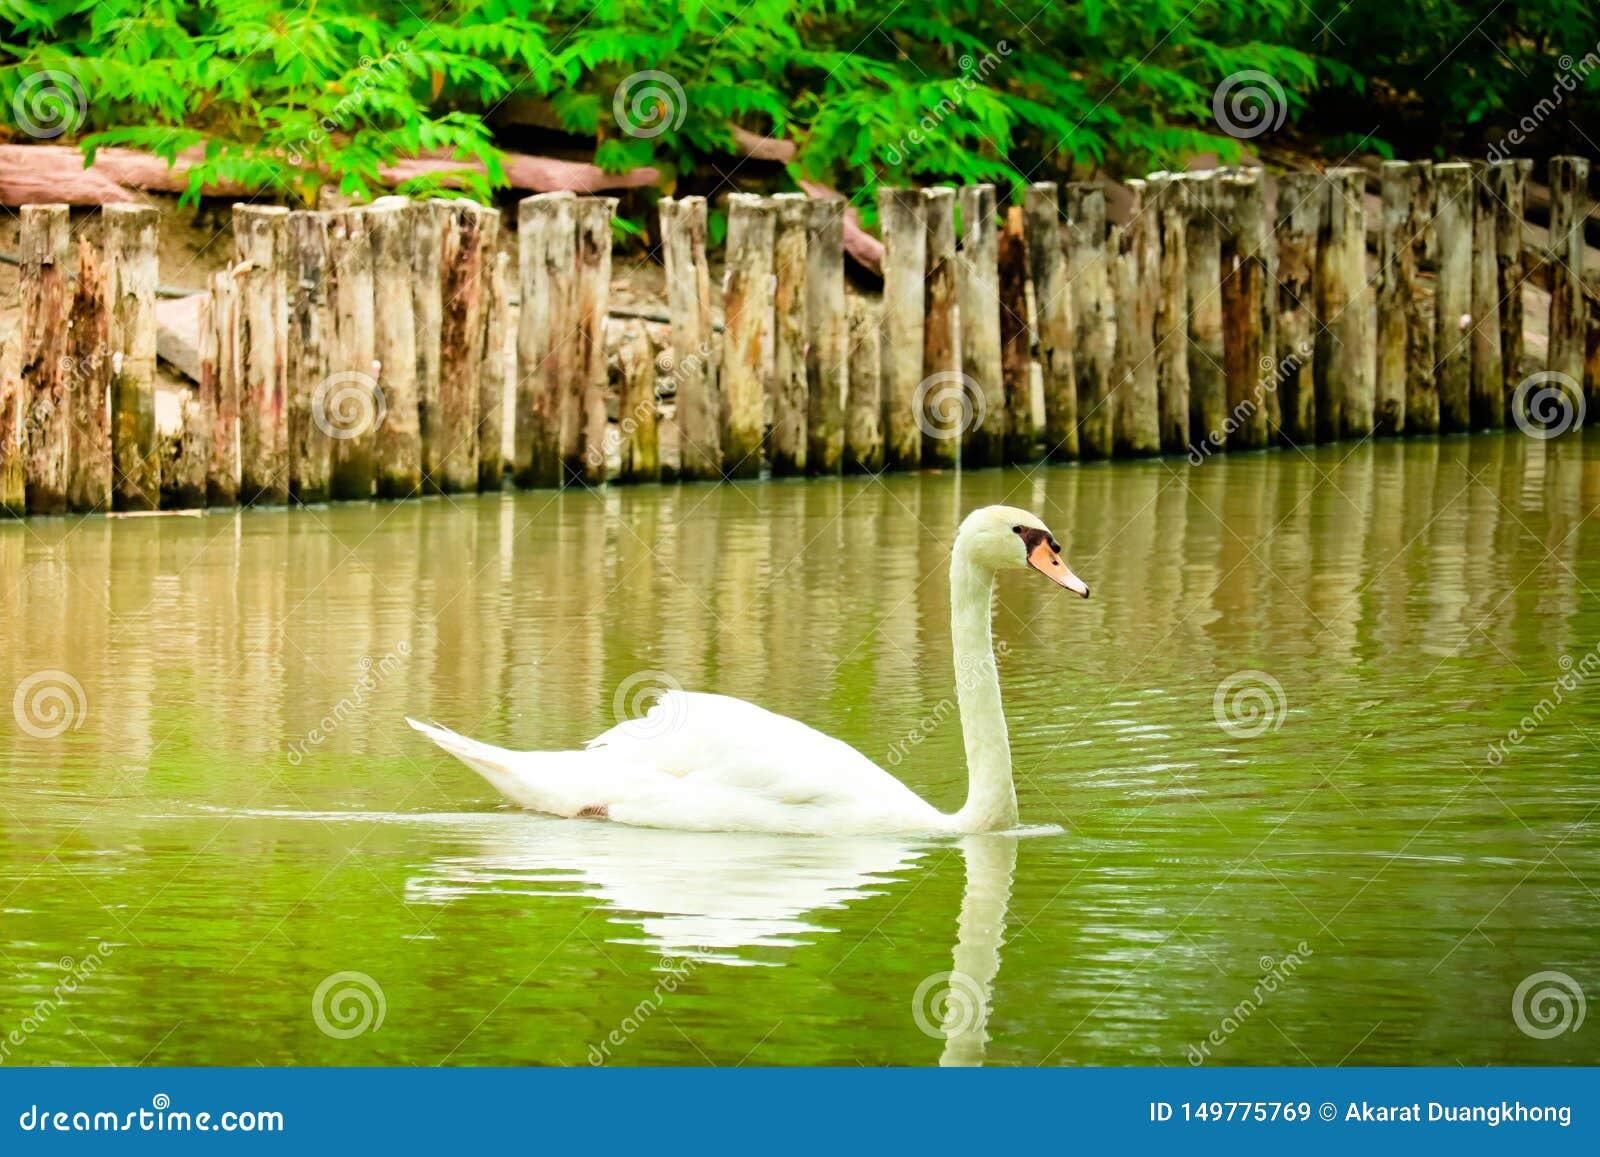 A cisne muda está nadando